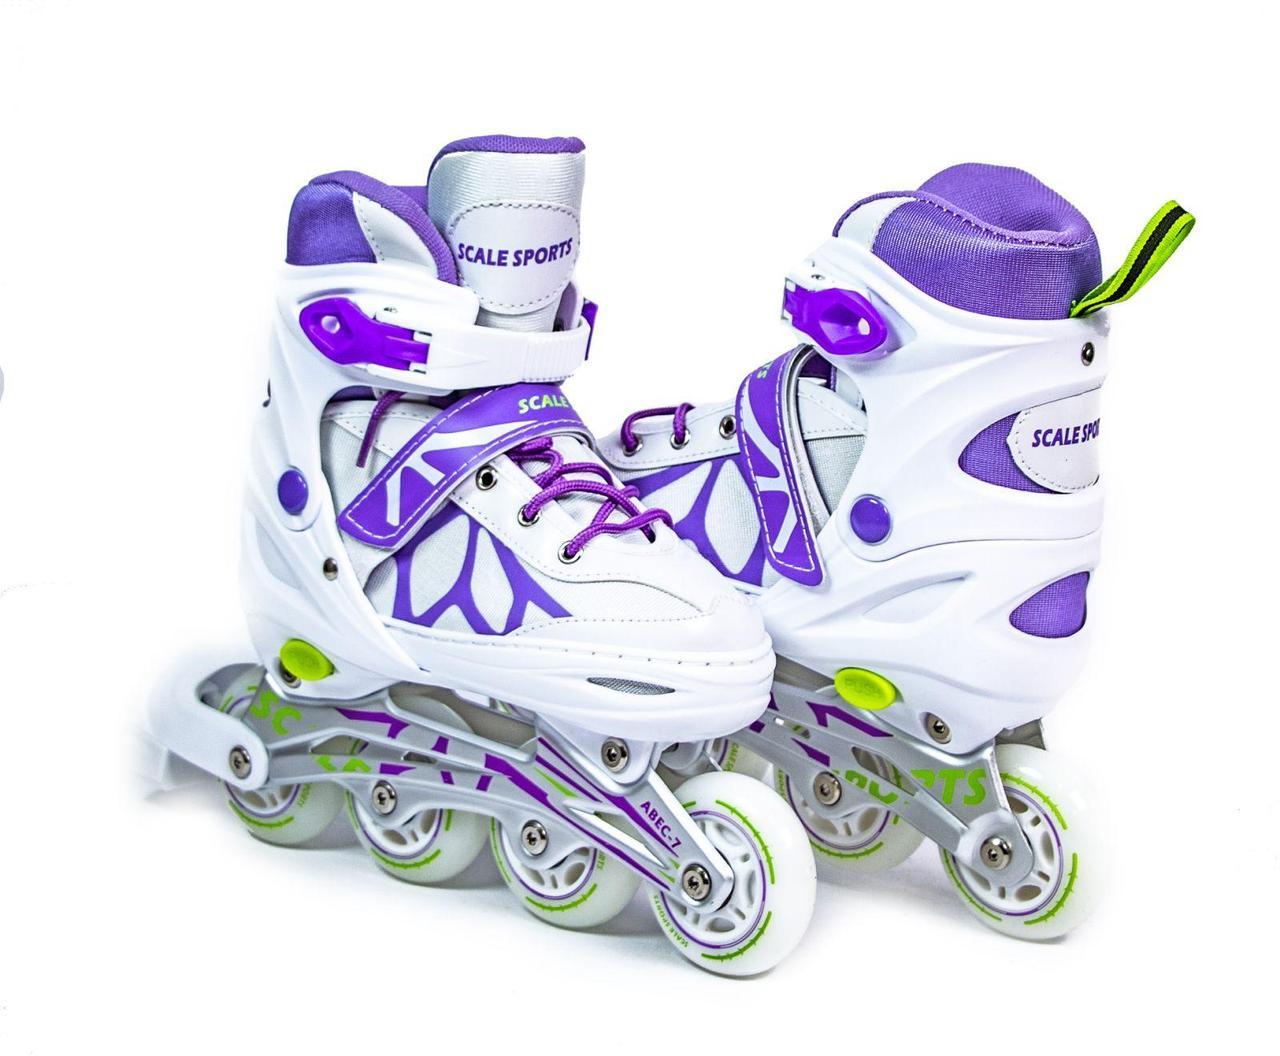 Ролики Scale Sports LF 601A бело-фиолетовые, размер 38-41